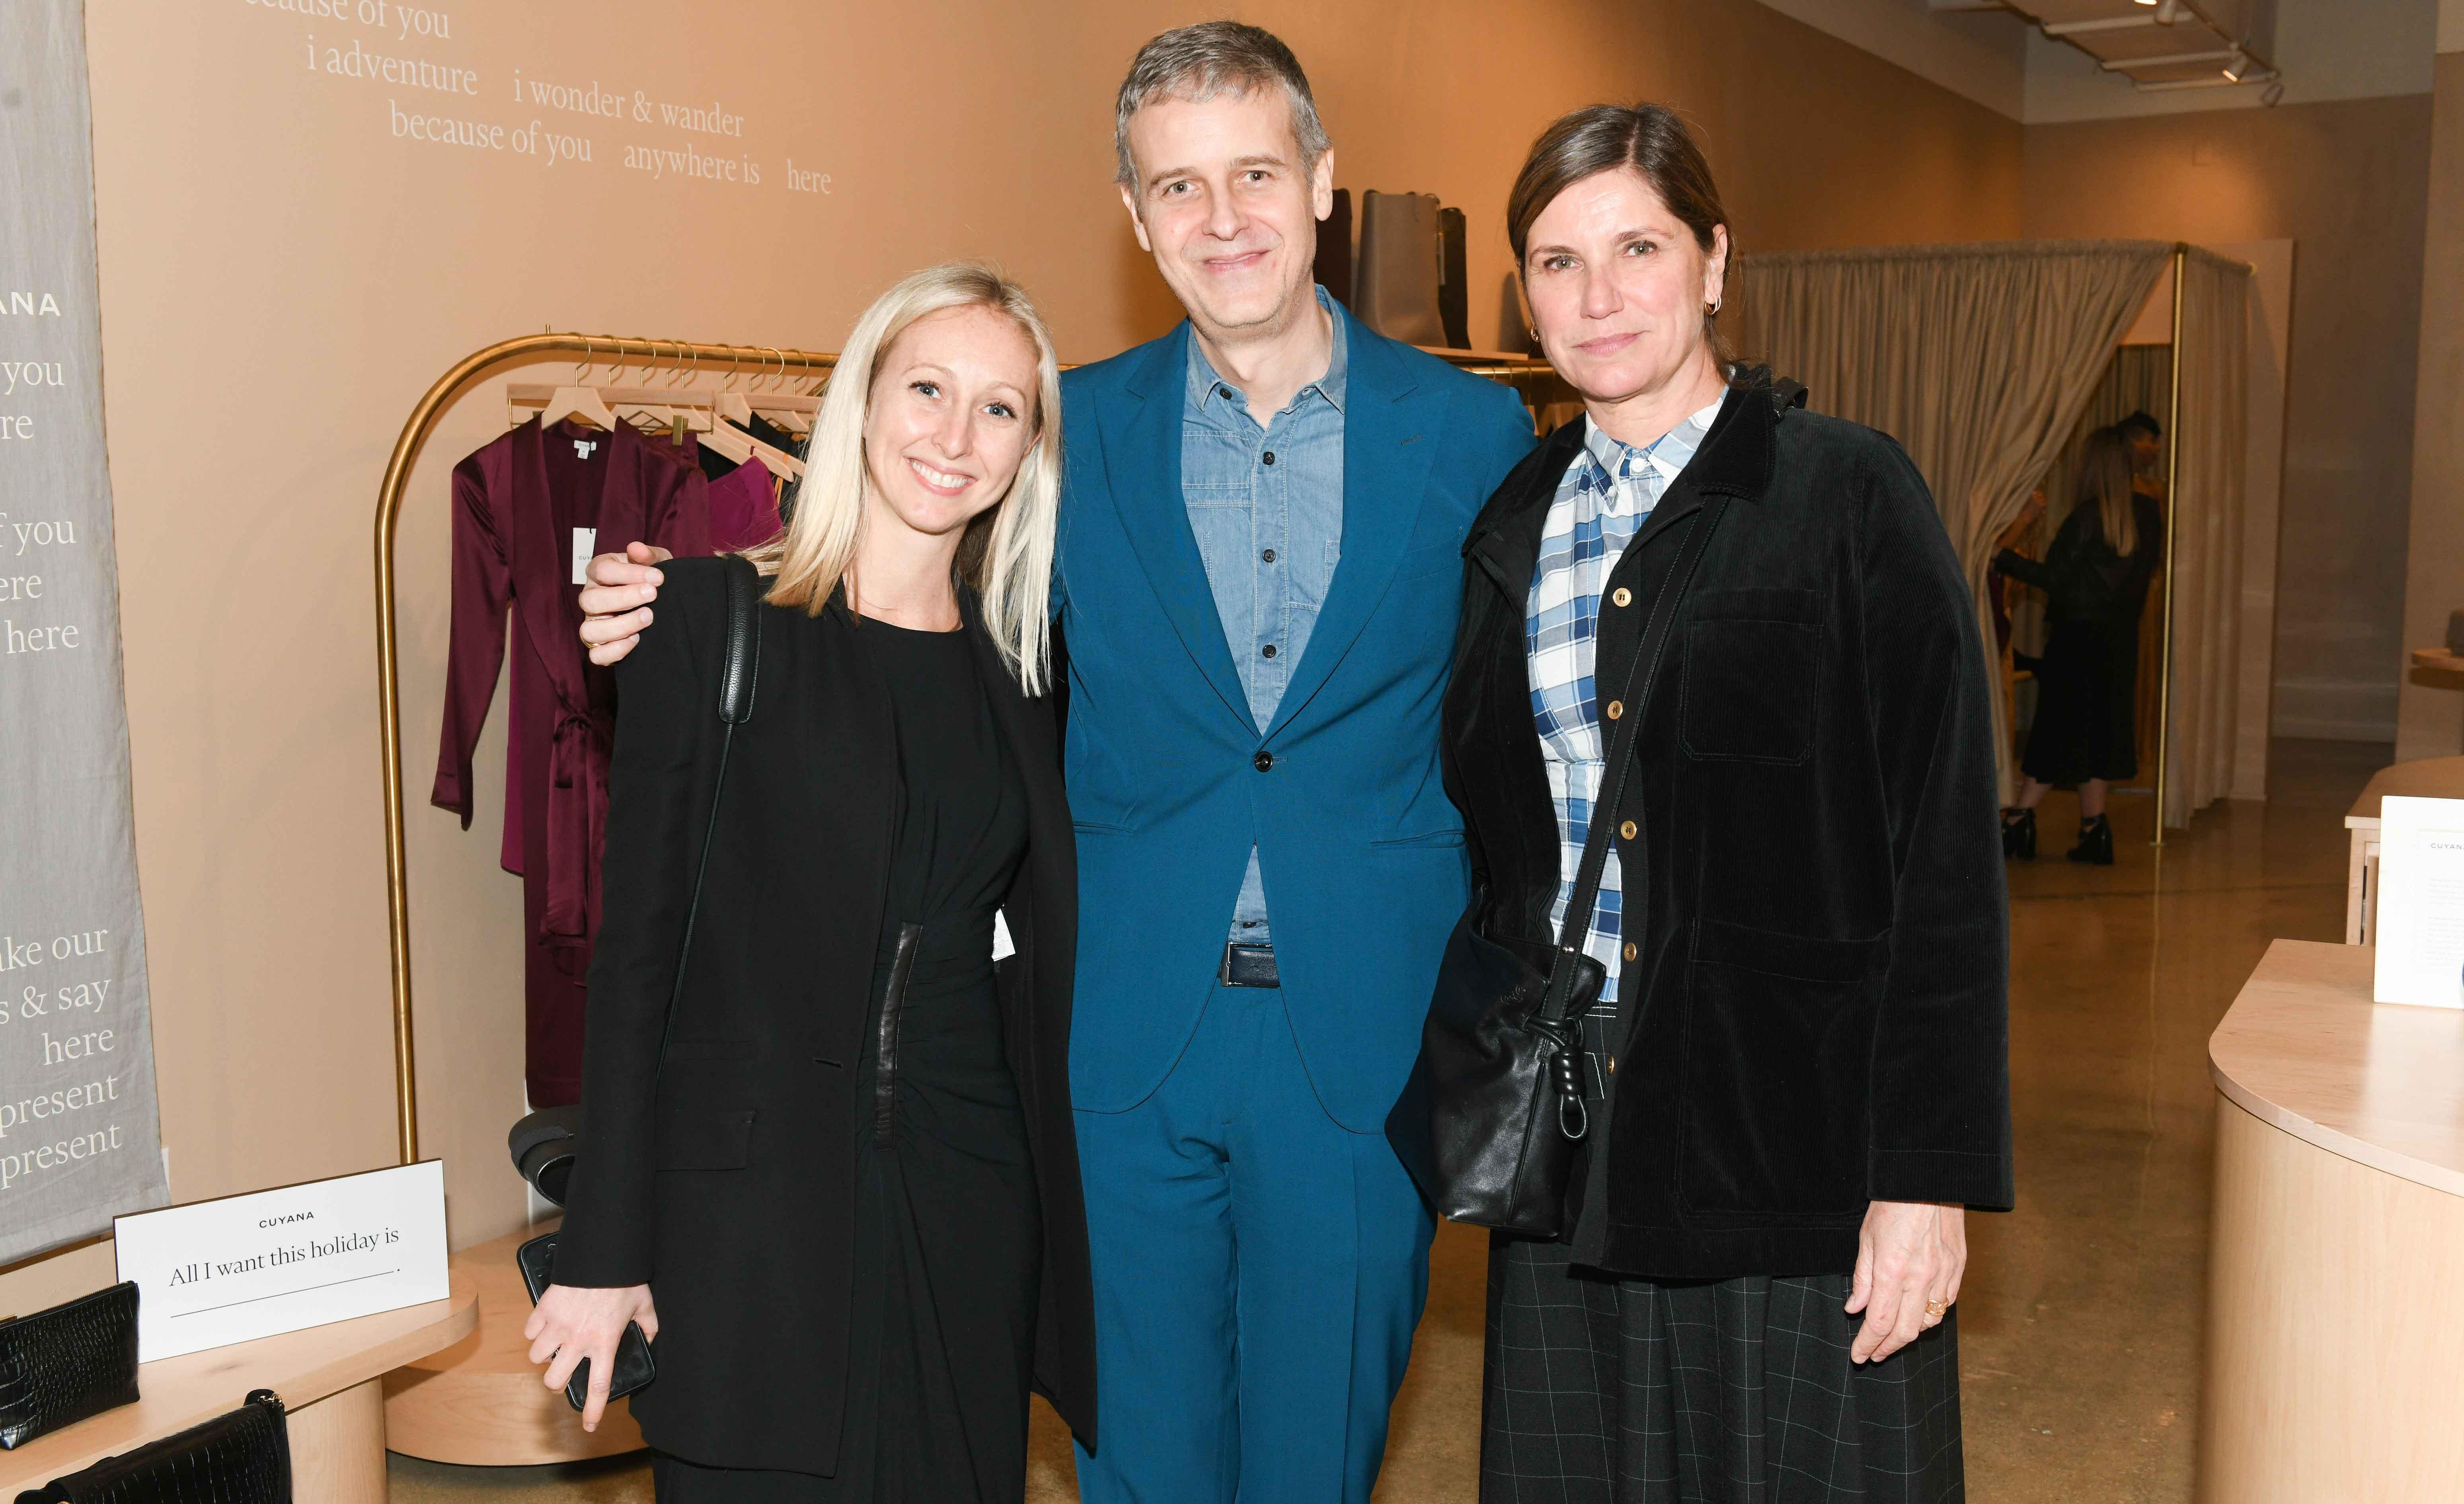 Sylvie Picquet, Armand Limnander and Sara Helmig